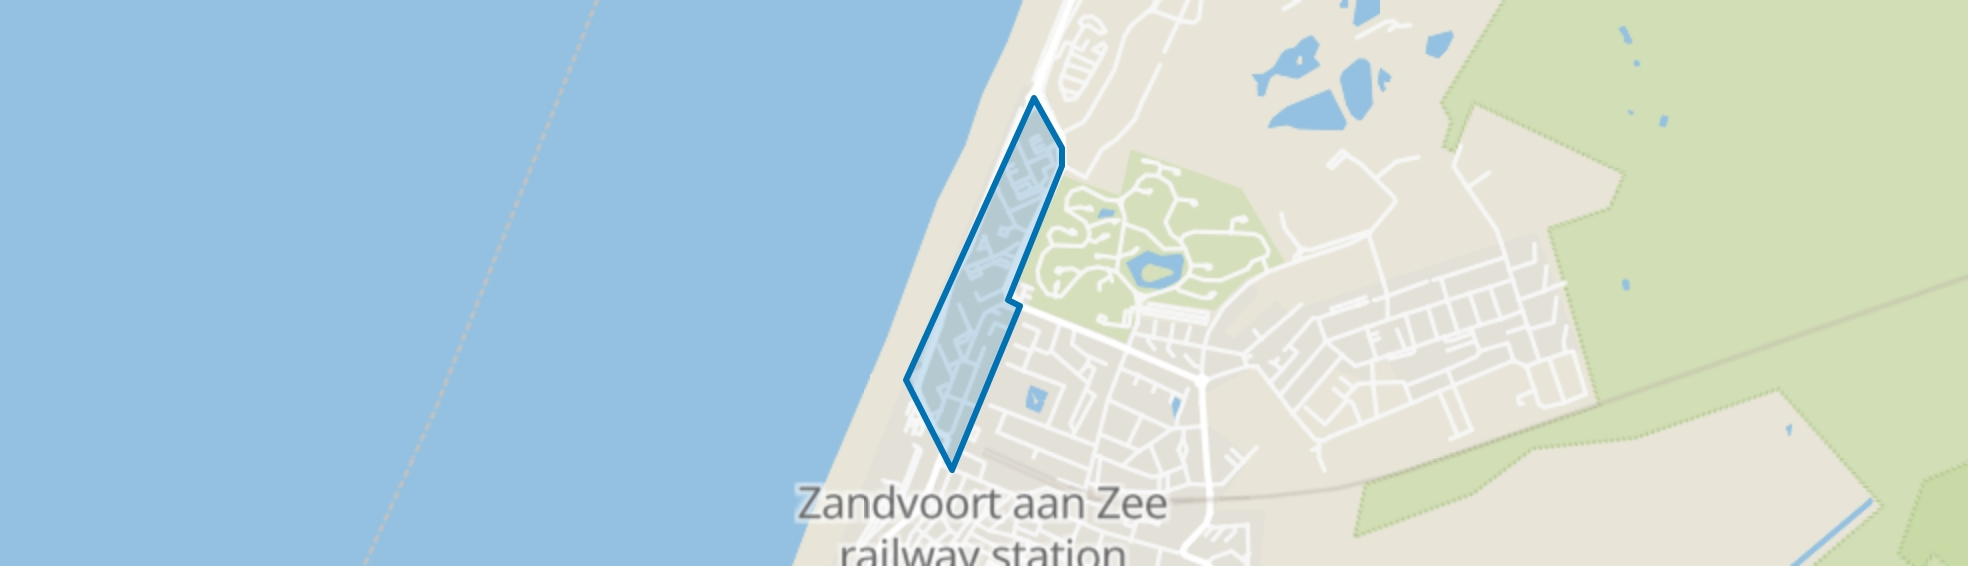 Boulevard Noord, Zandvoort map